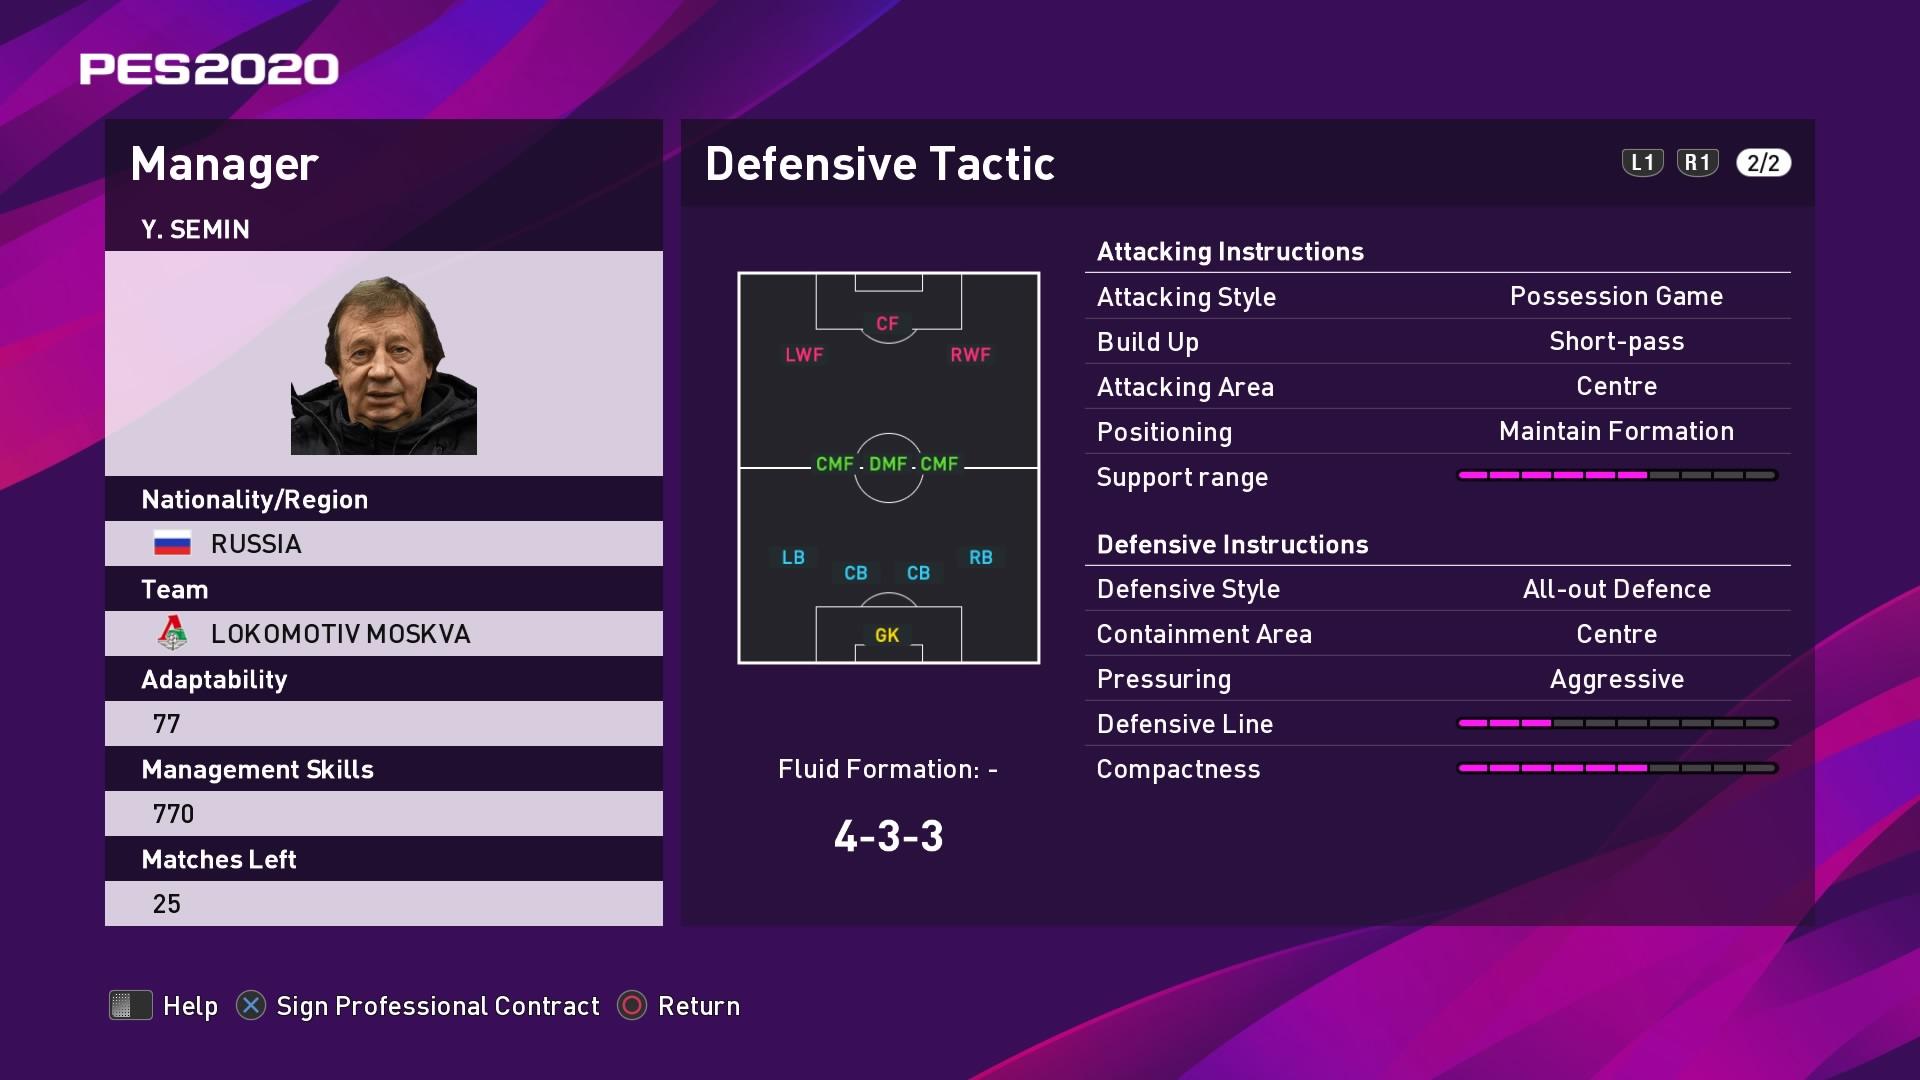 Y. Semin (2) (Yuri Semin) Defensive Tactic in PES 2020 myClub